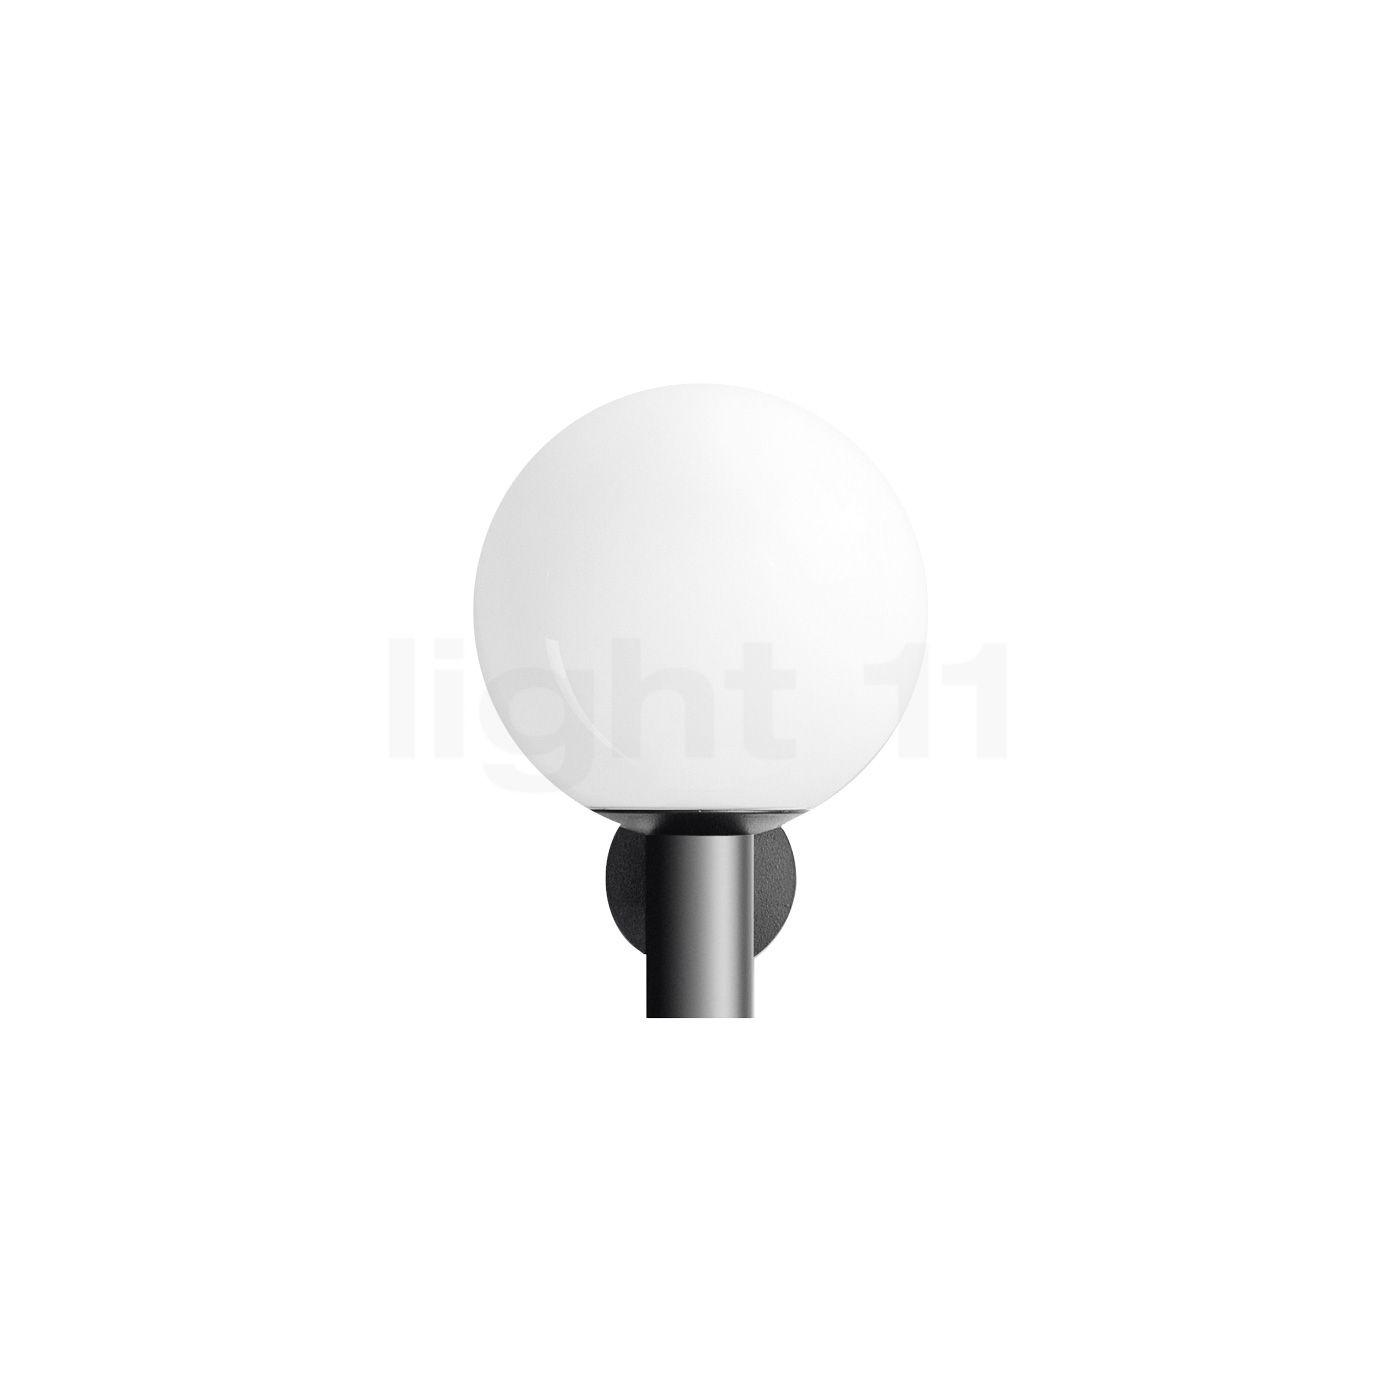 bega 55648 wandleuchte fluo kaufen bei. Black Bedroom Furniture Sets. Home Design Ideas